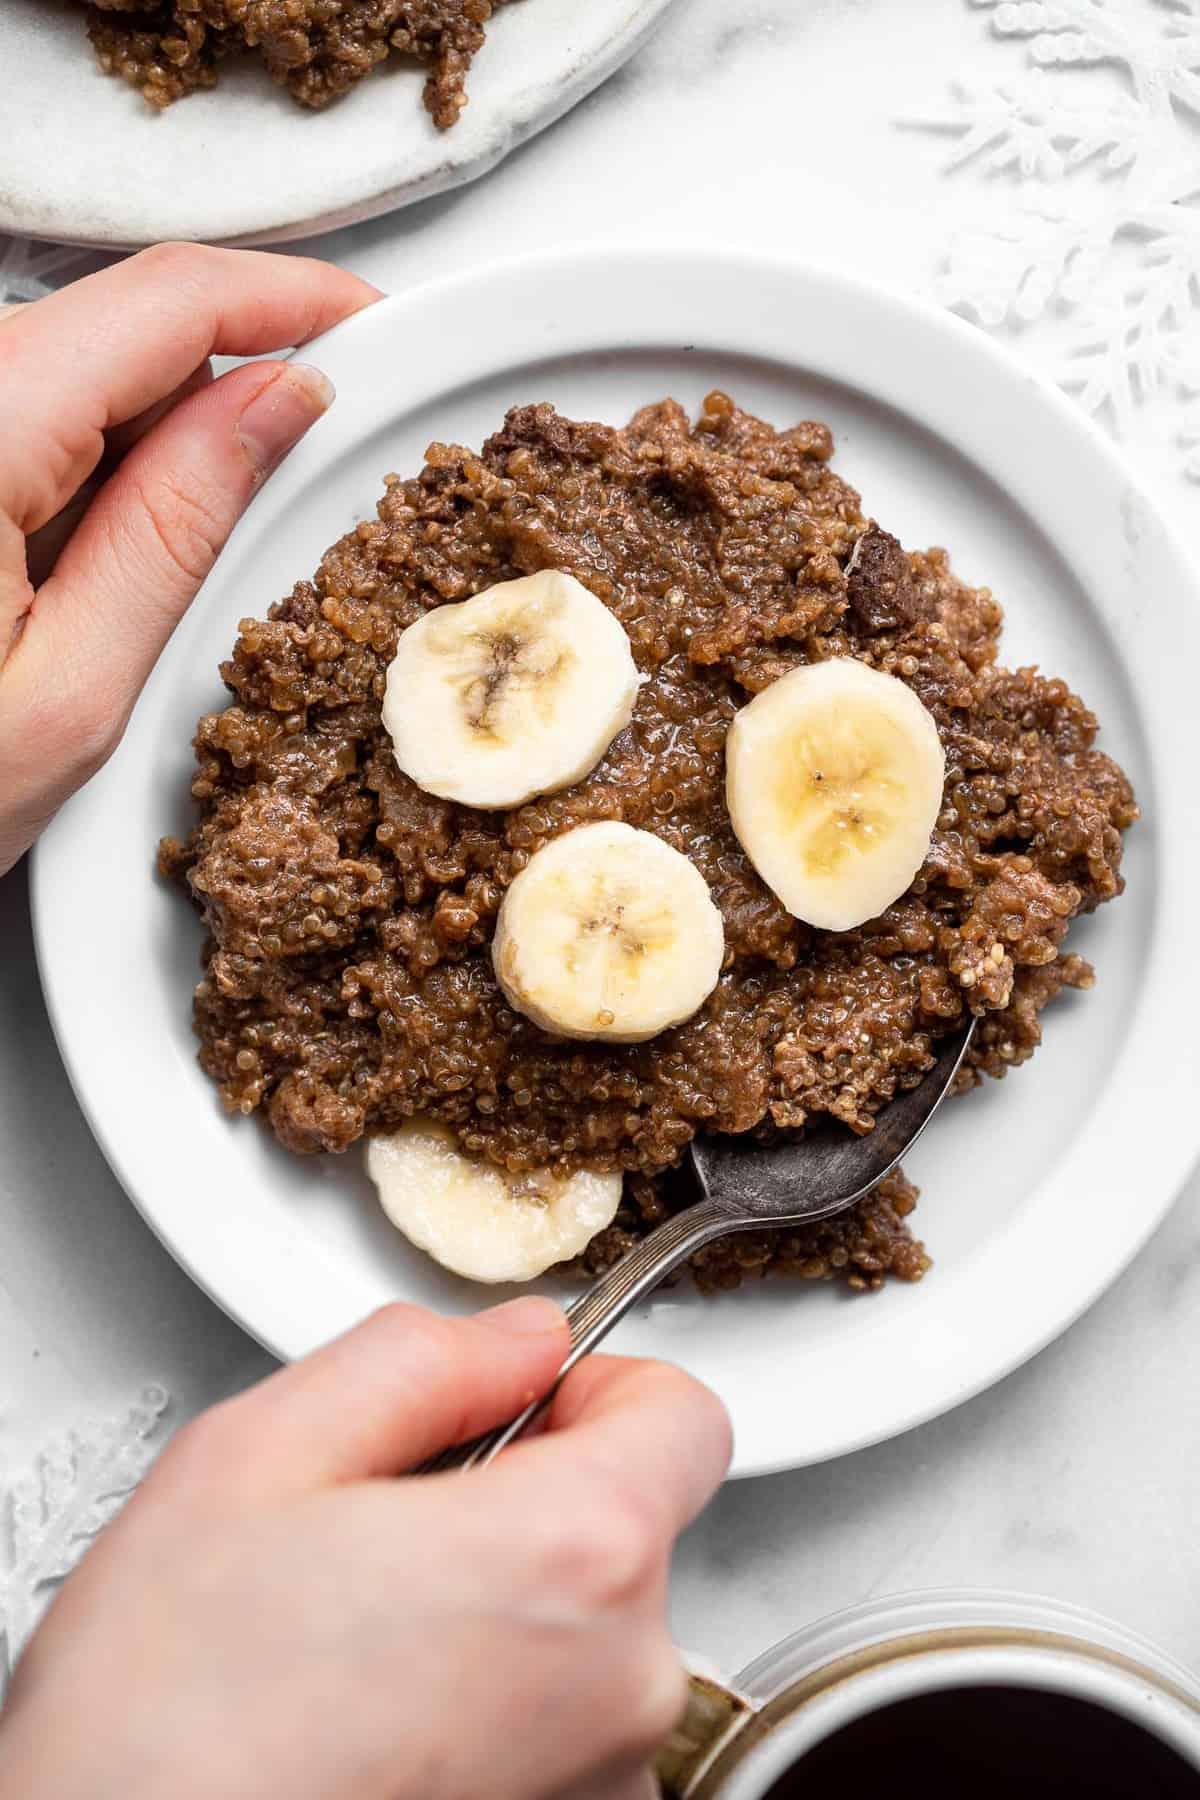 a hand holding a plate of quinoa breakfast bake